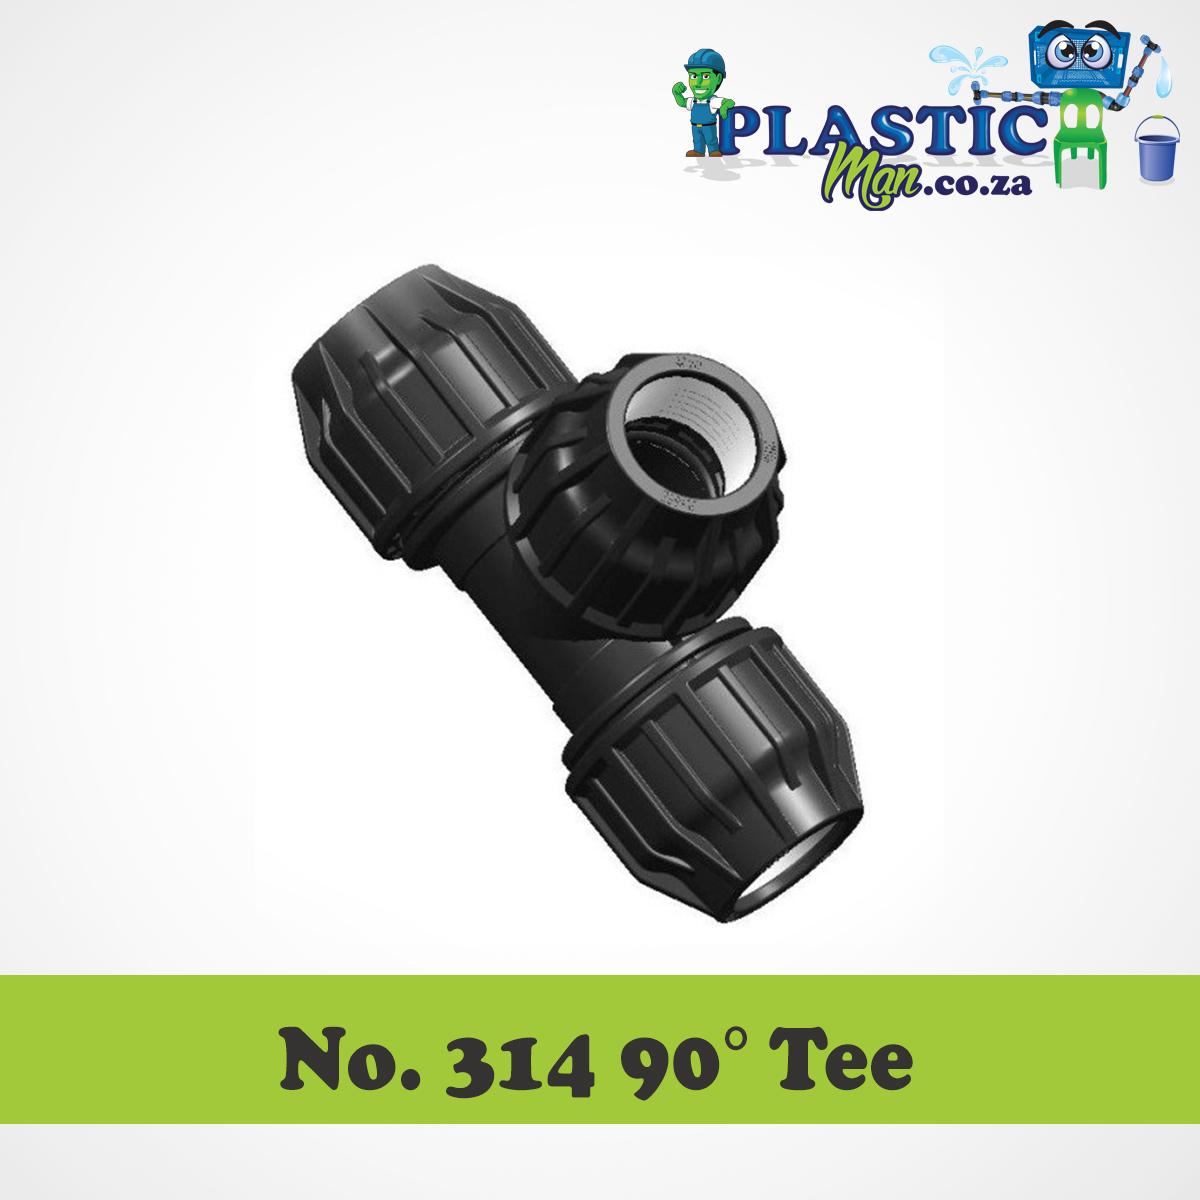 Plasticman HDPE - 90 degree Tee